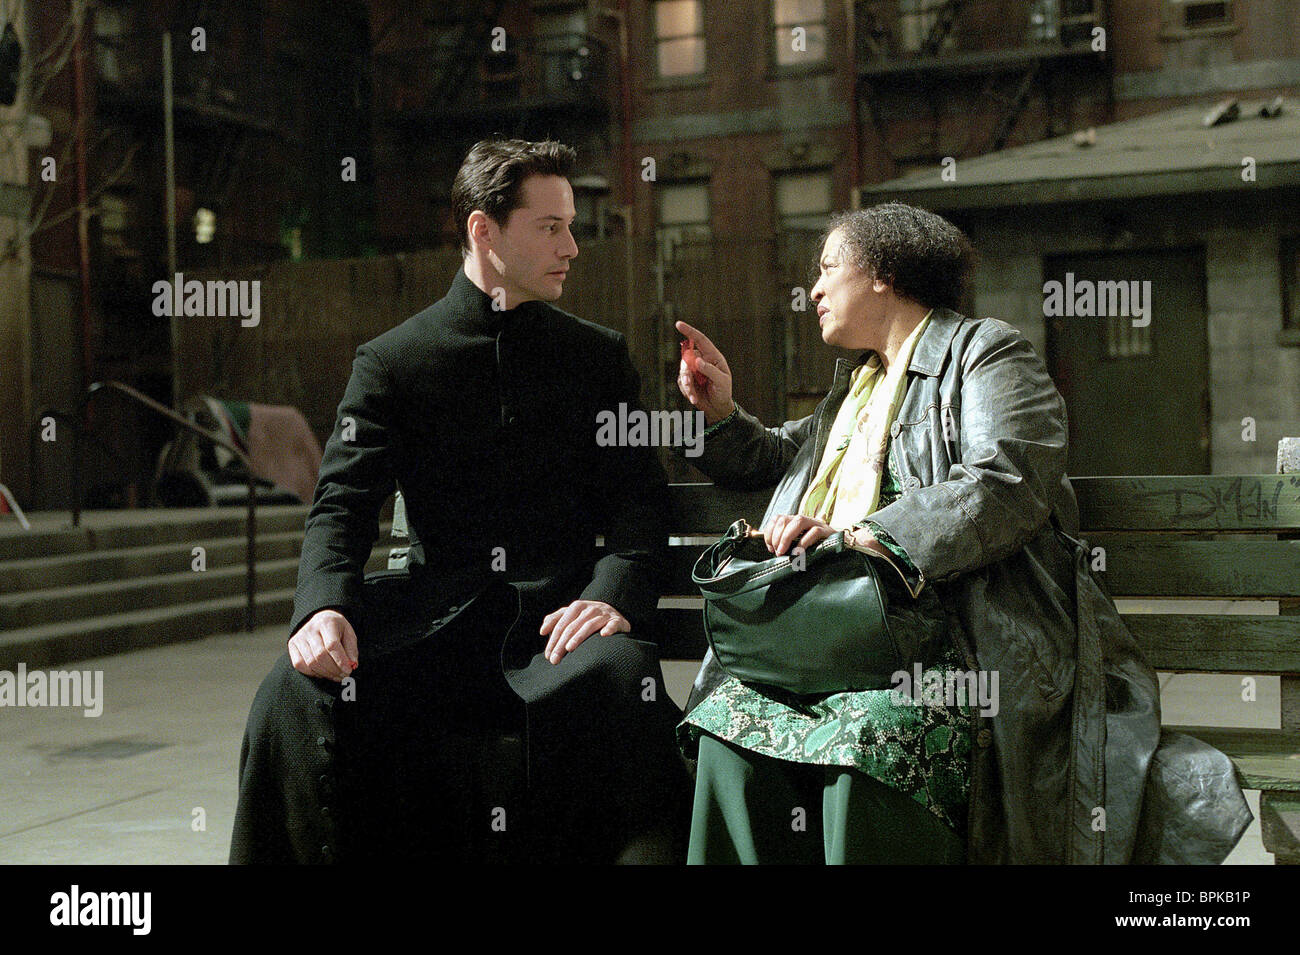 Keanu Reeves Gloria Foster The Matrix Reloaded 2003 Stock Photo Alamy